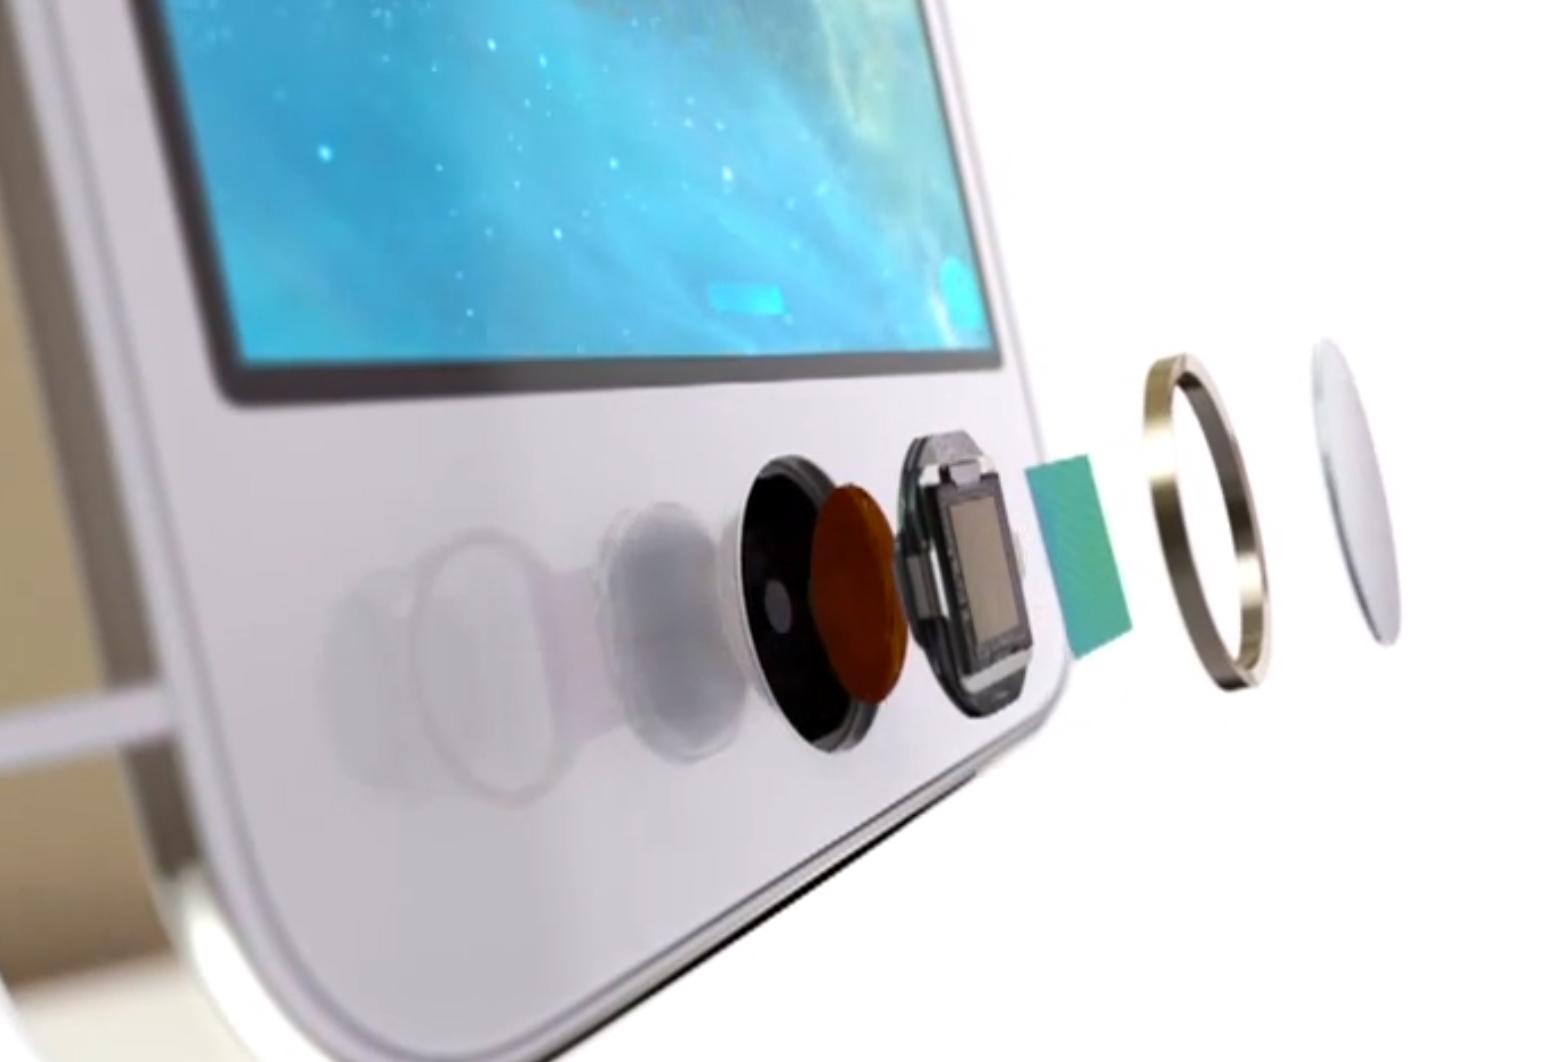 iphone mất vân tay iphone mất vân tay - Có nên mua iphone mất vân tay ?